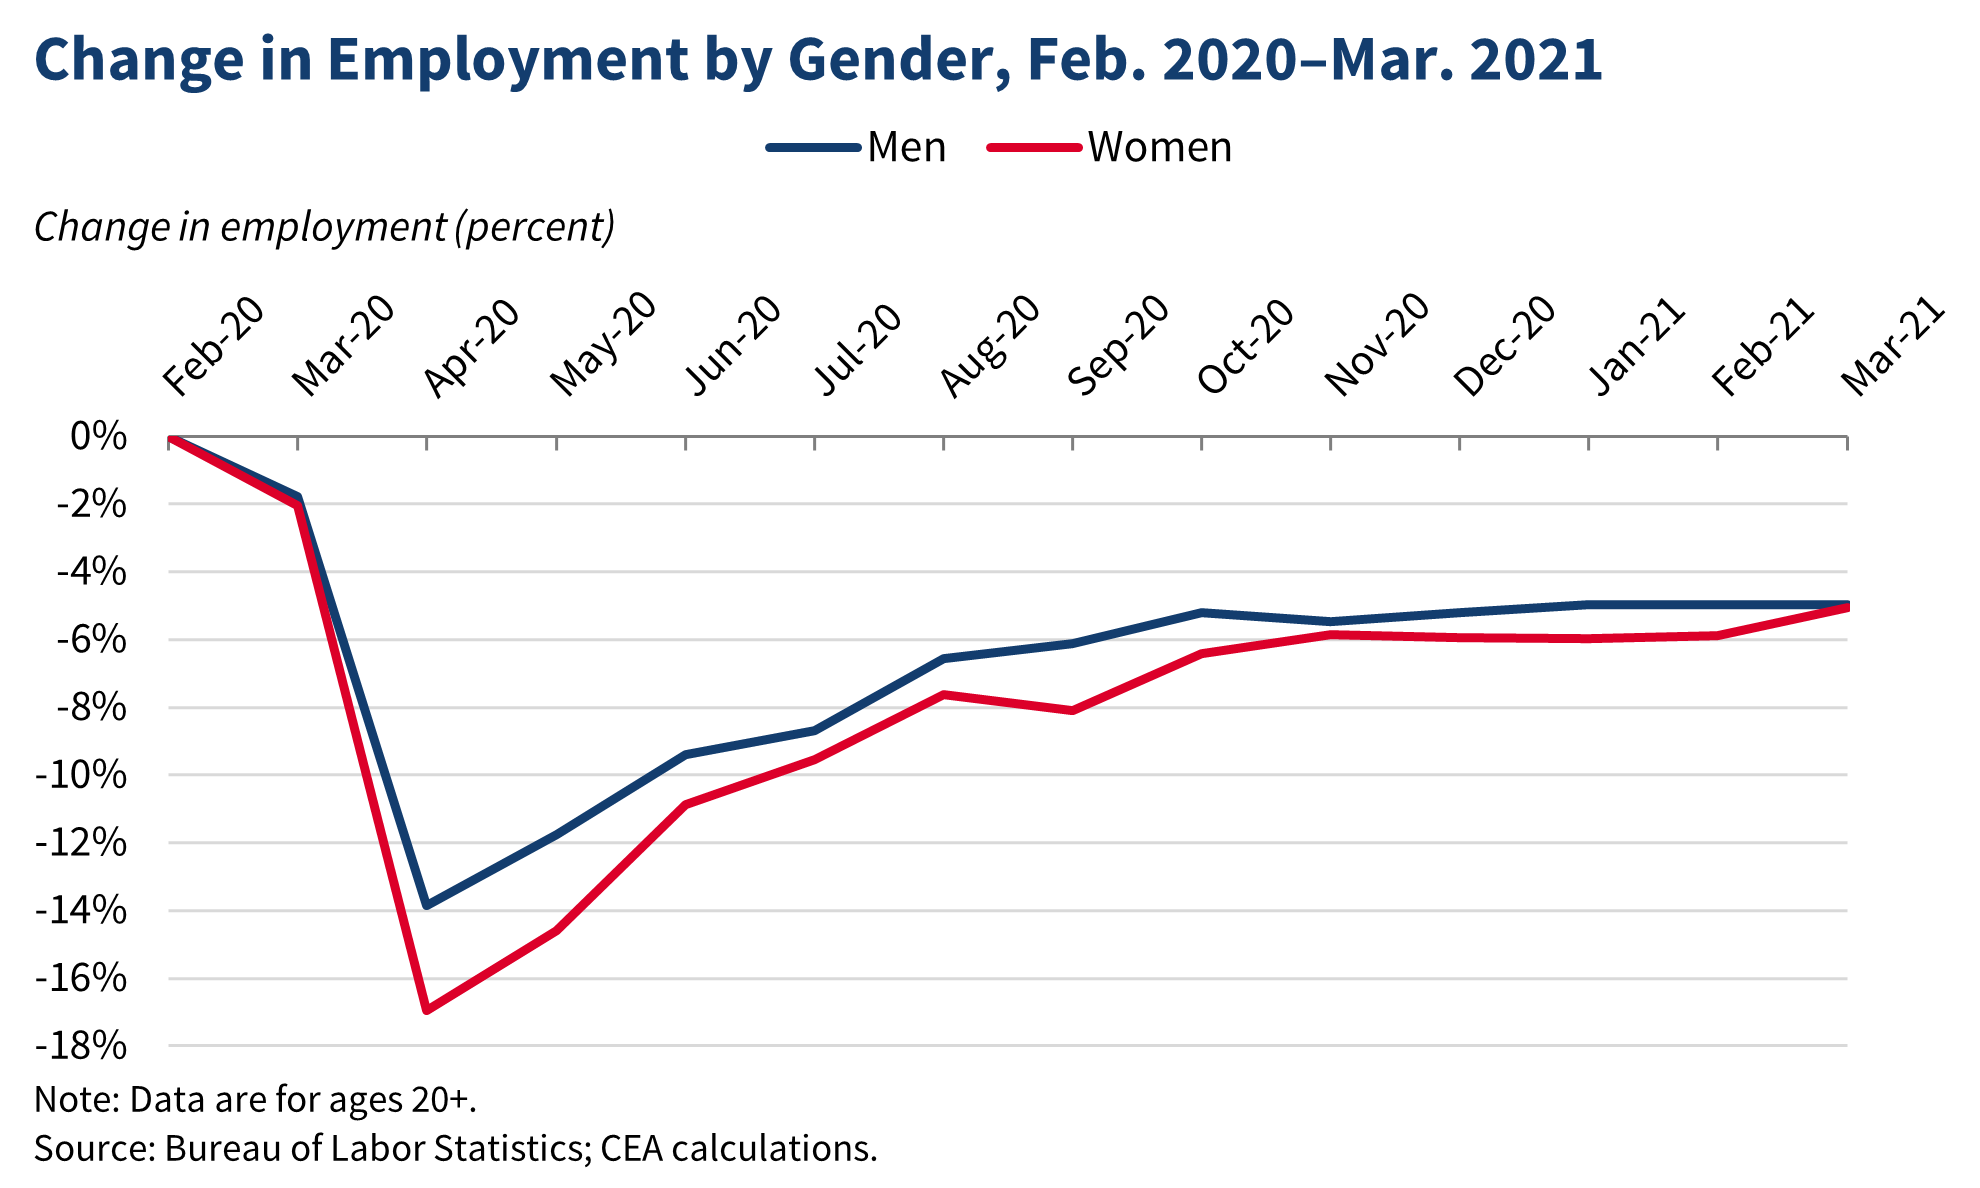 Change in Employment by Gender, Feb. 2020-Mar. 2021